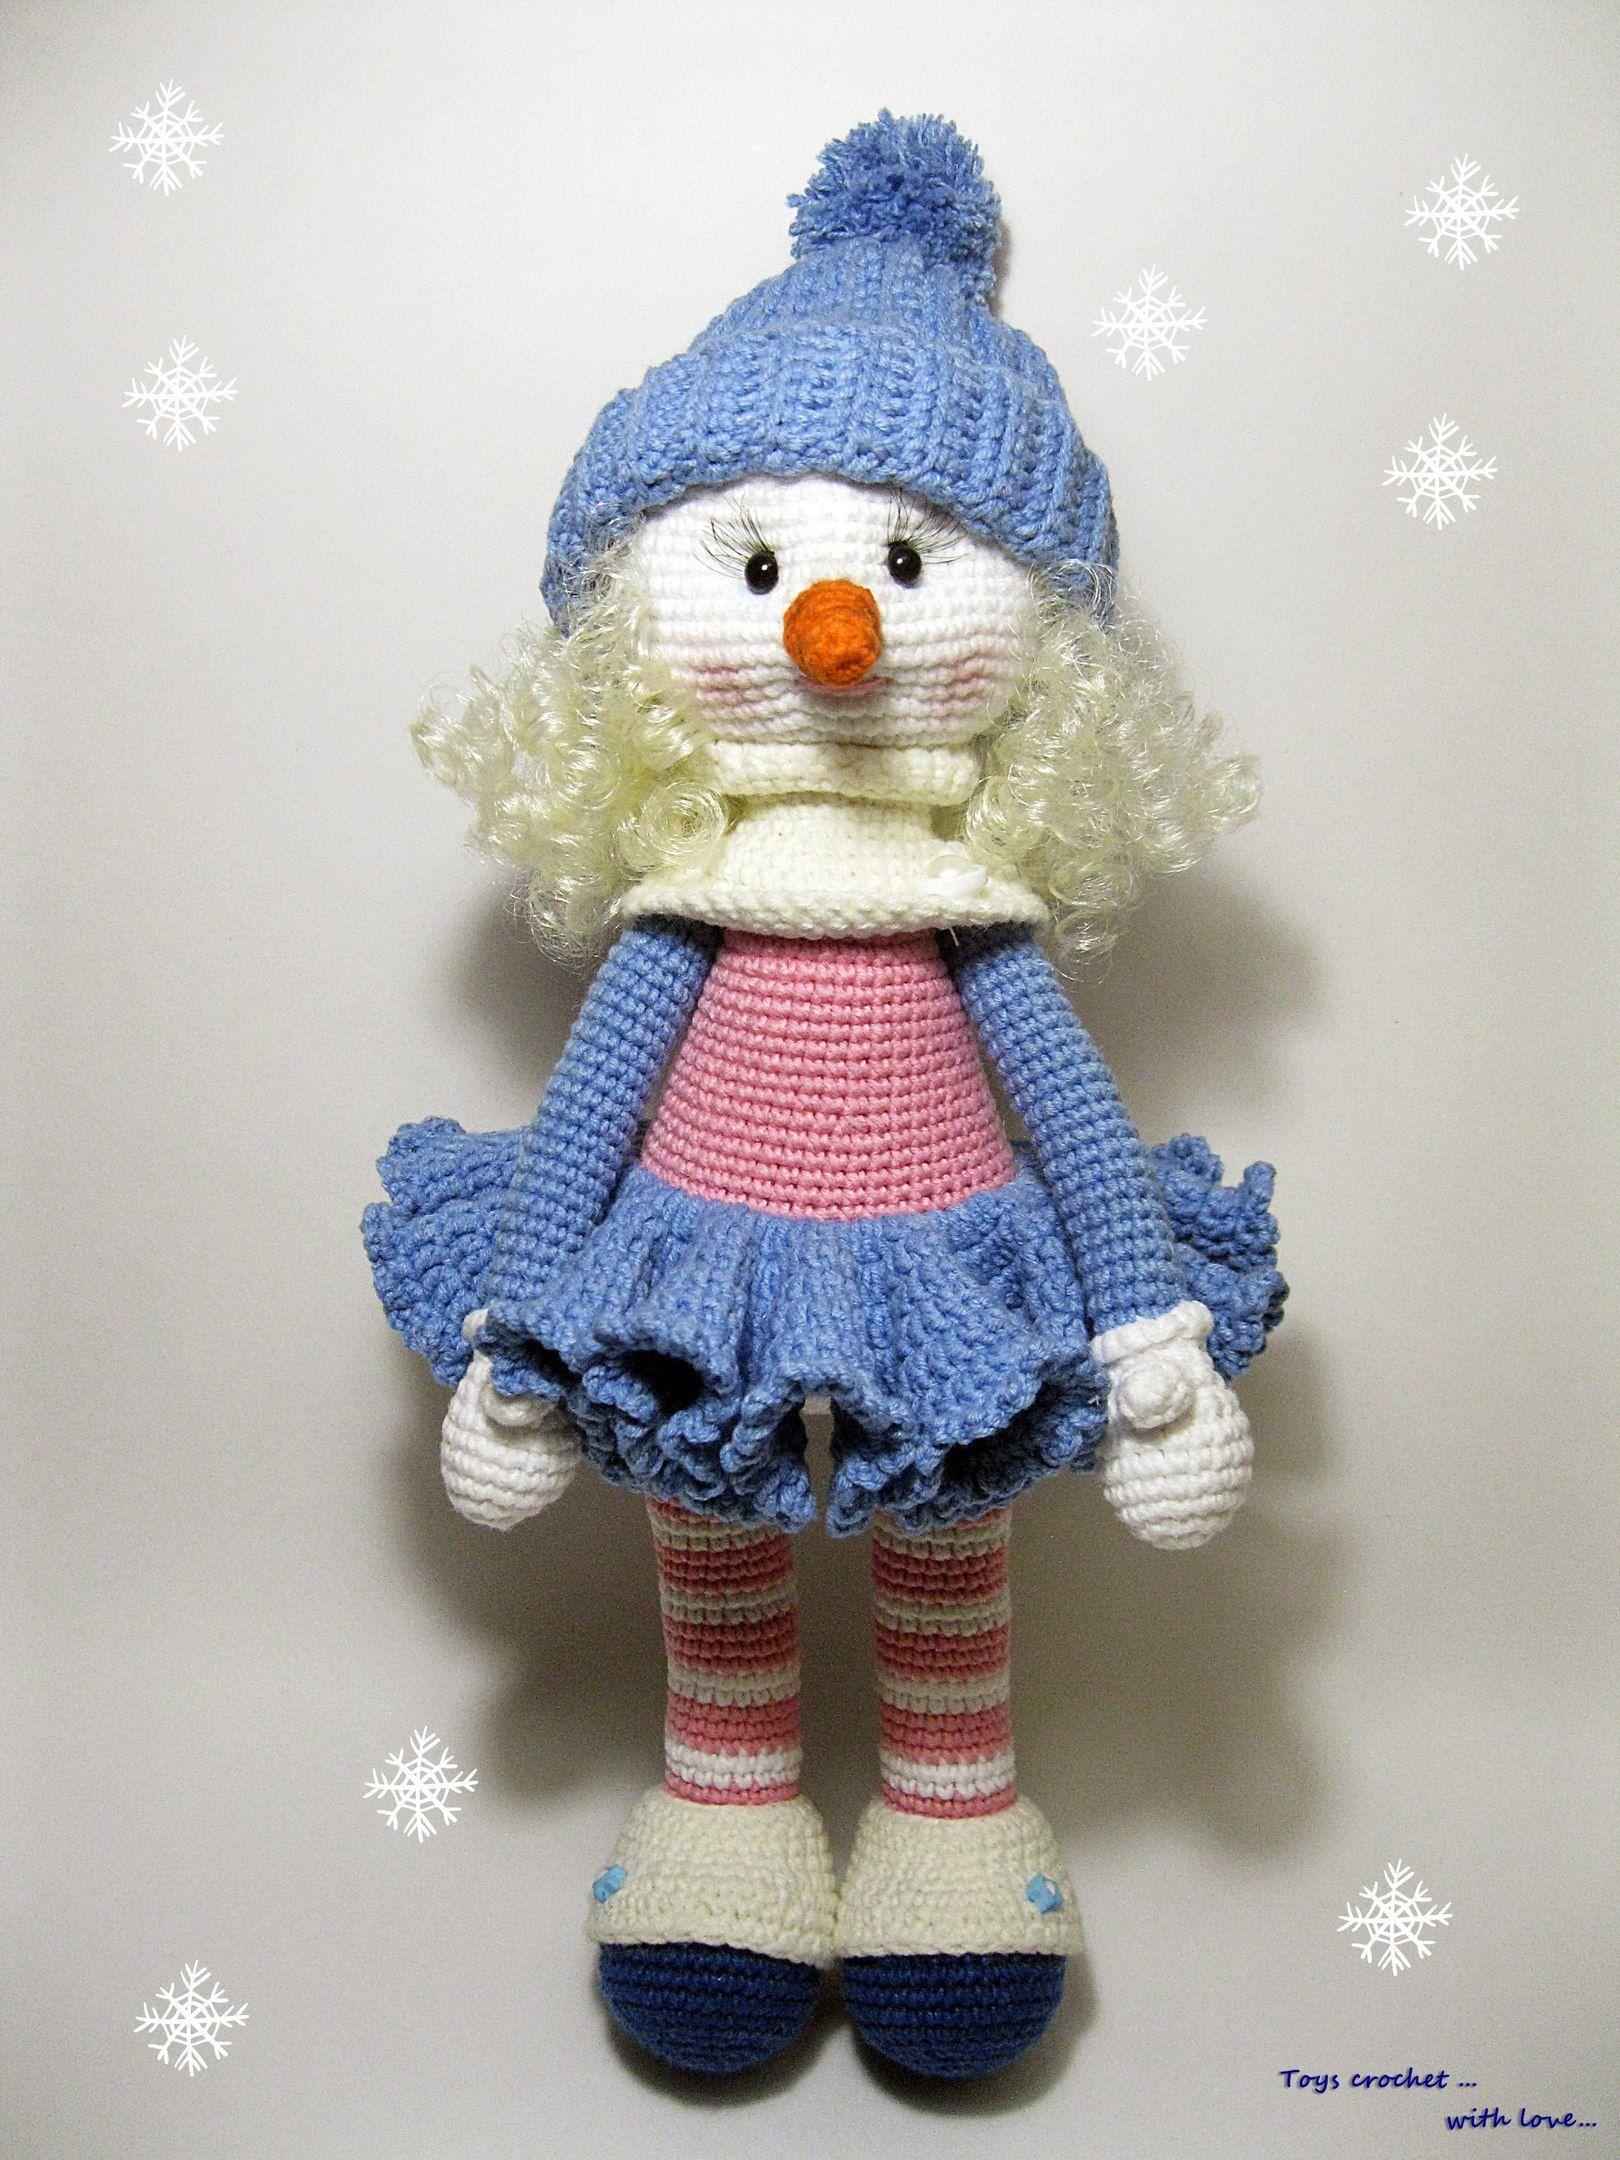 Toys crochet. With love... Мастерская игрушек | VK | Crochet Dolls ...